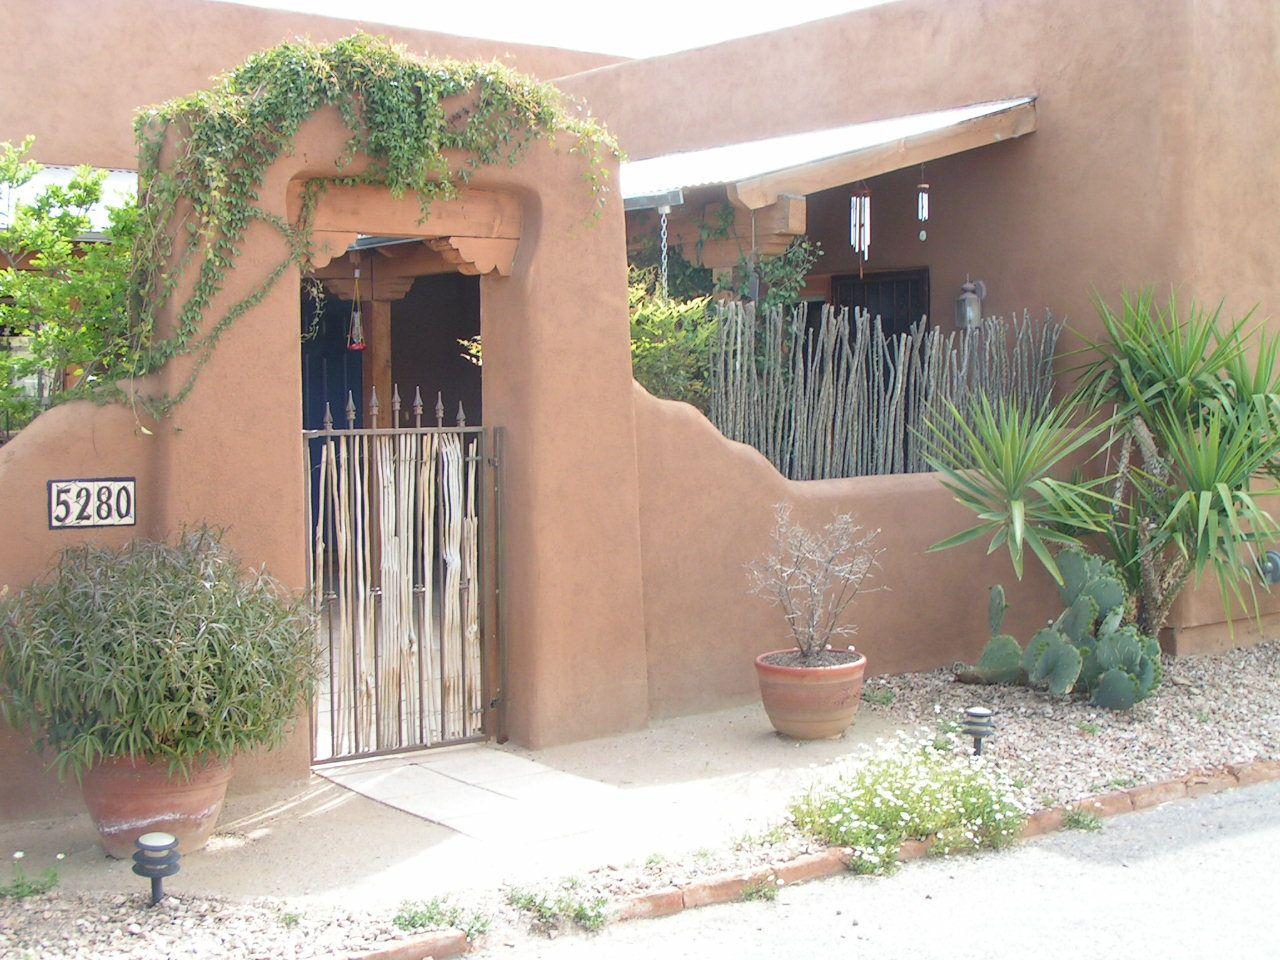 Tucson Garden Tour 2005 Gardening Inspirations Pinterest  # Gadsden Muebles